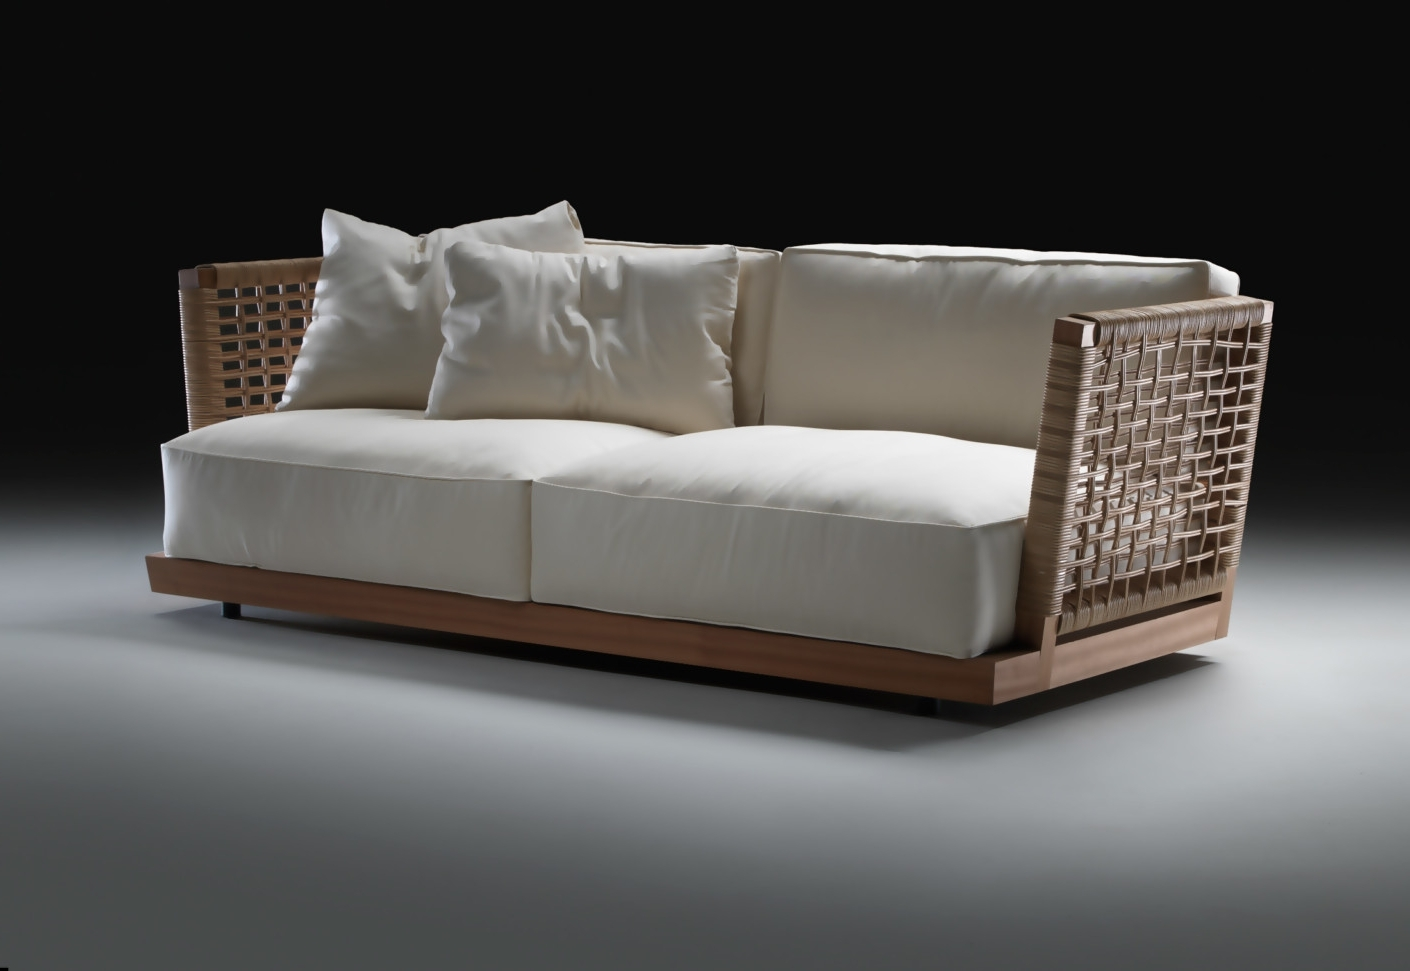 Stylepark Throughout Flexform Sofas (View 19 of 20)